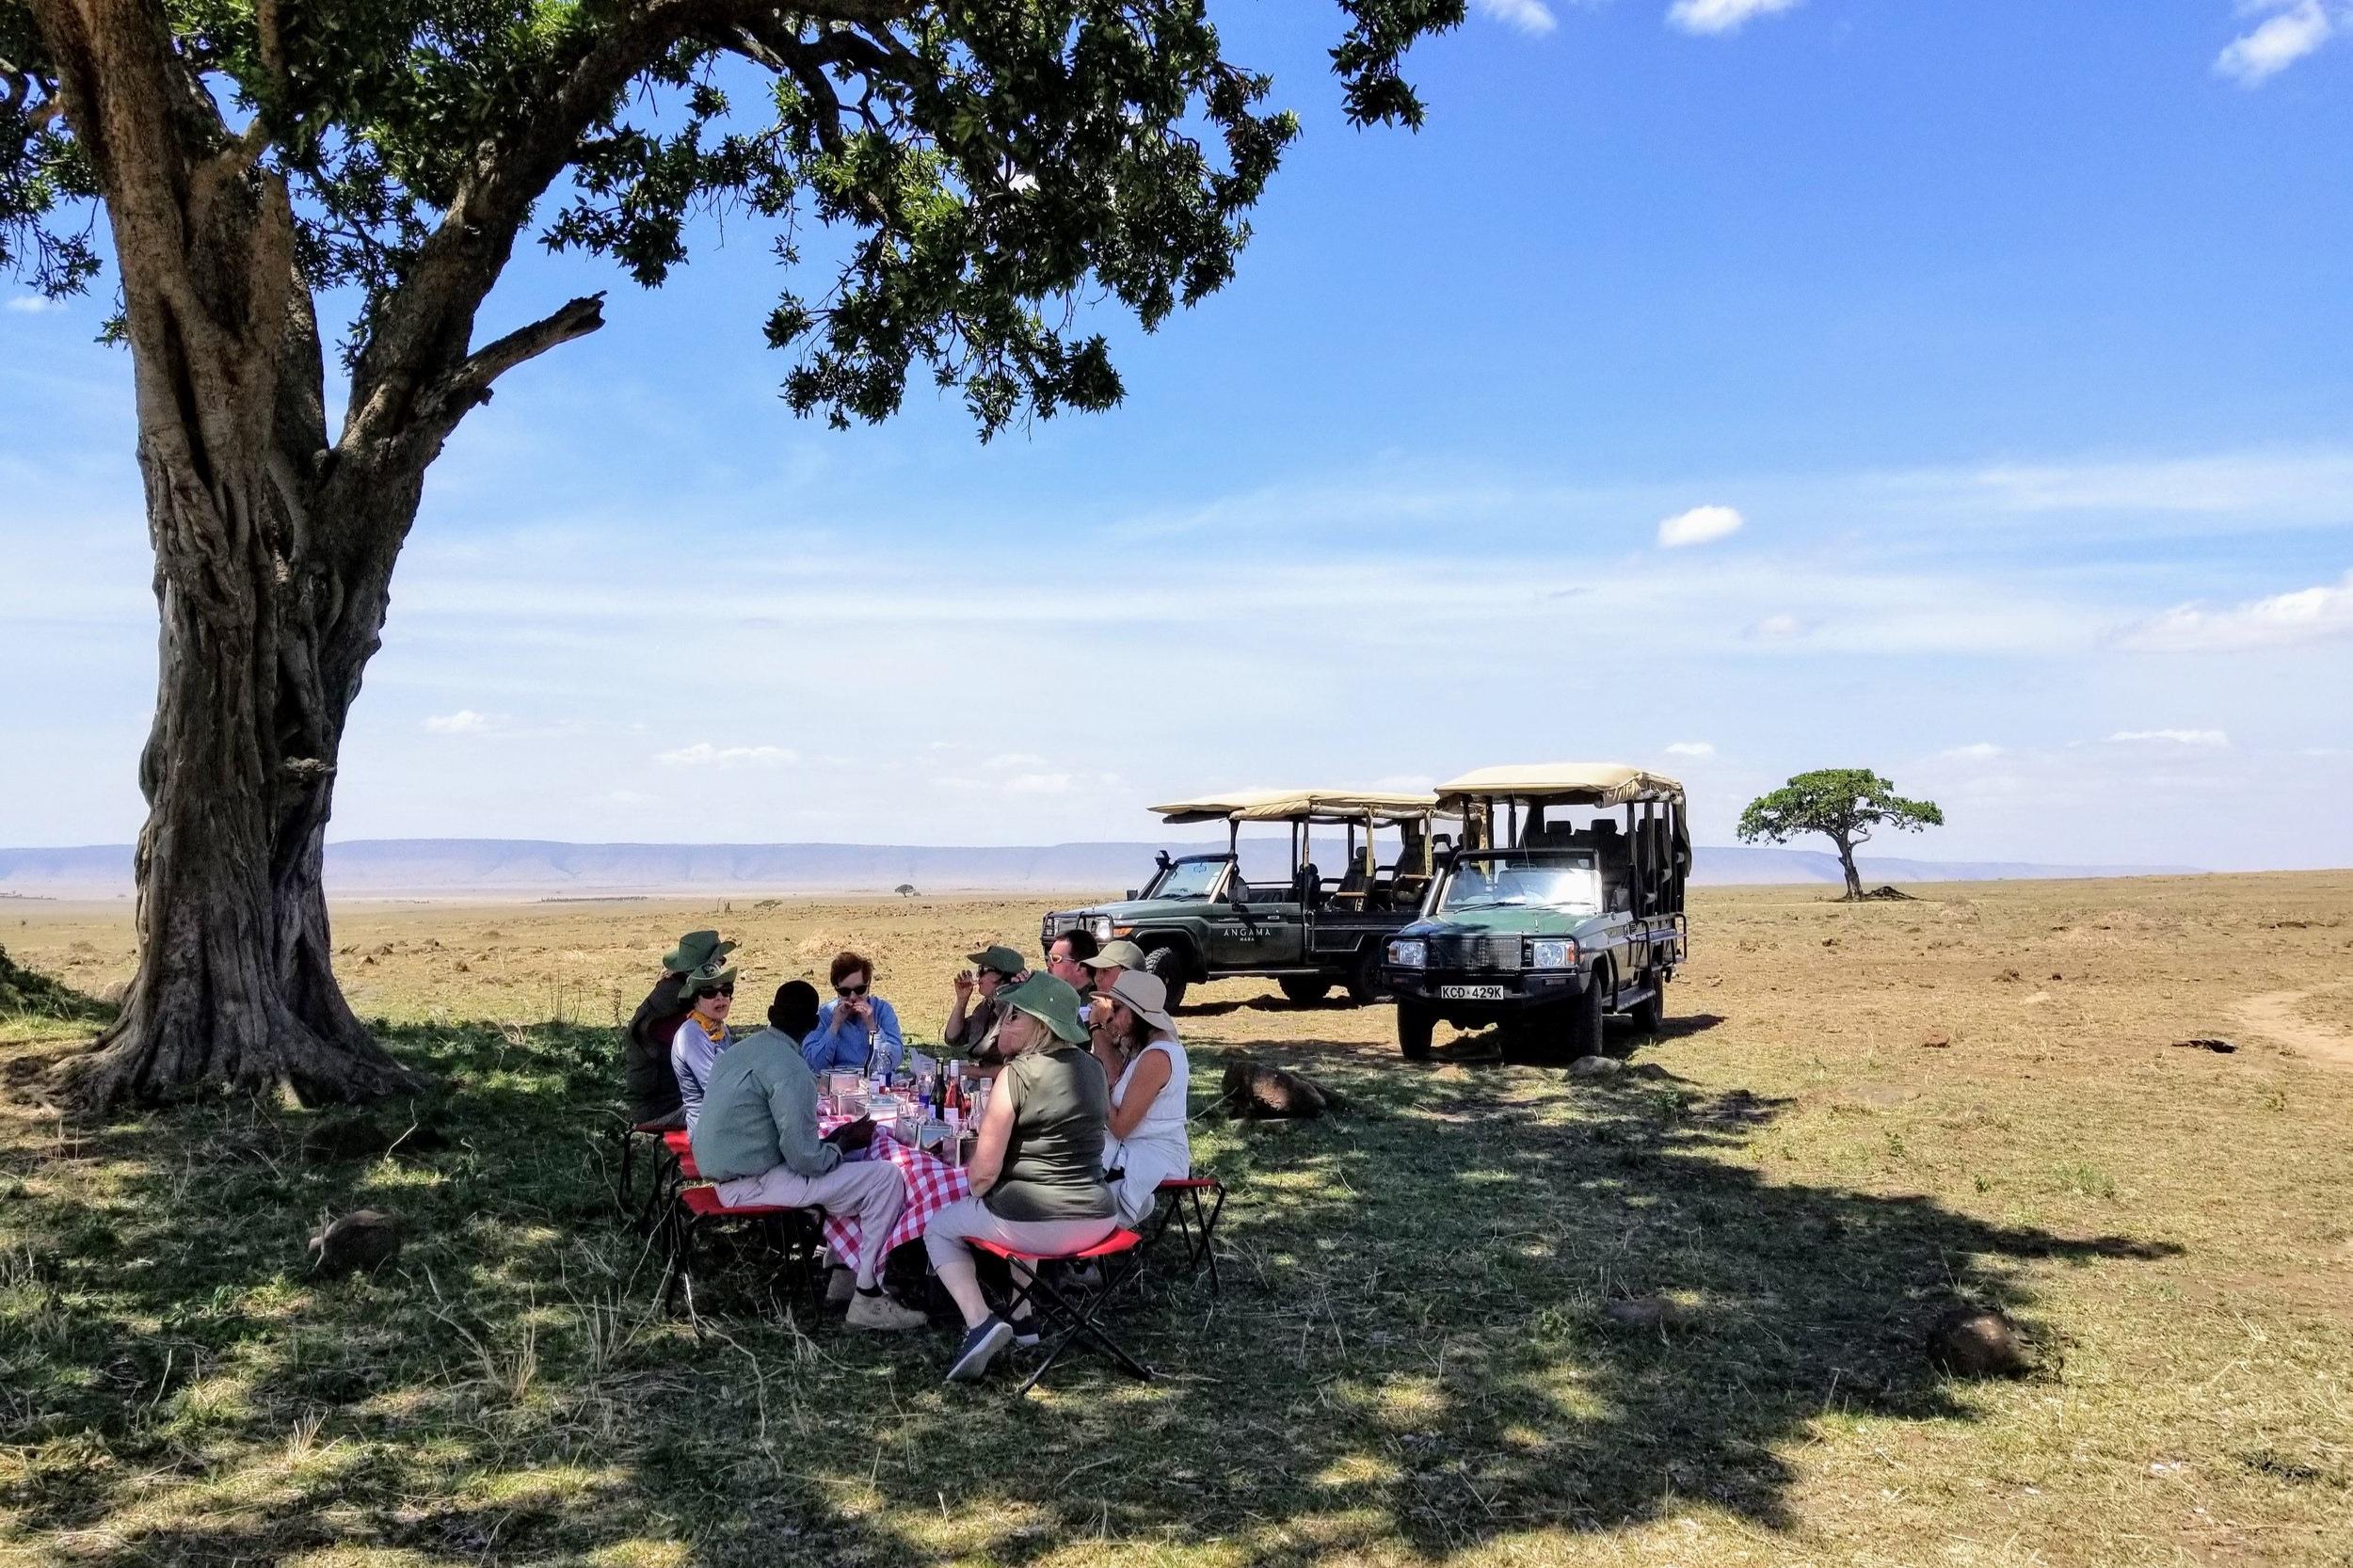 African Safari - Explore Africawith Micato Safari